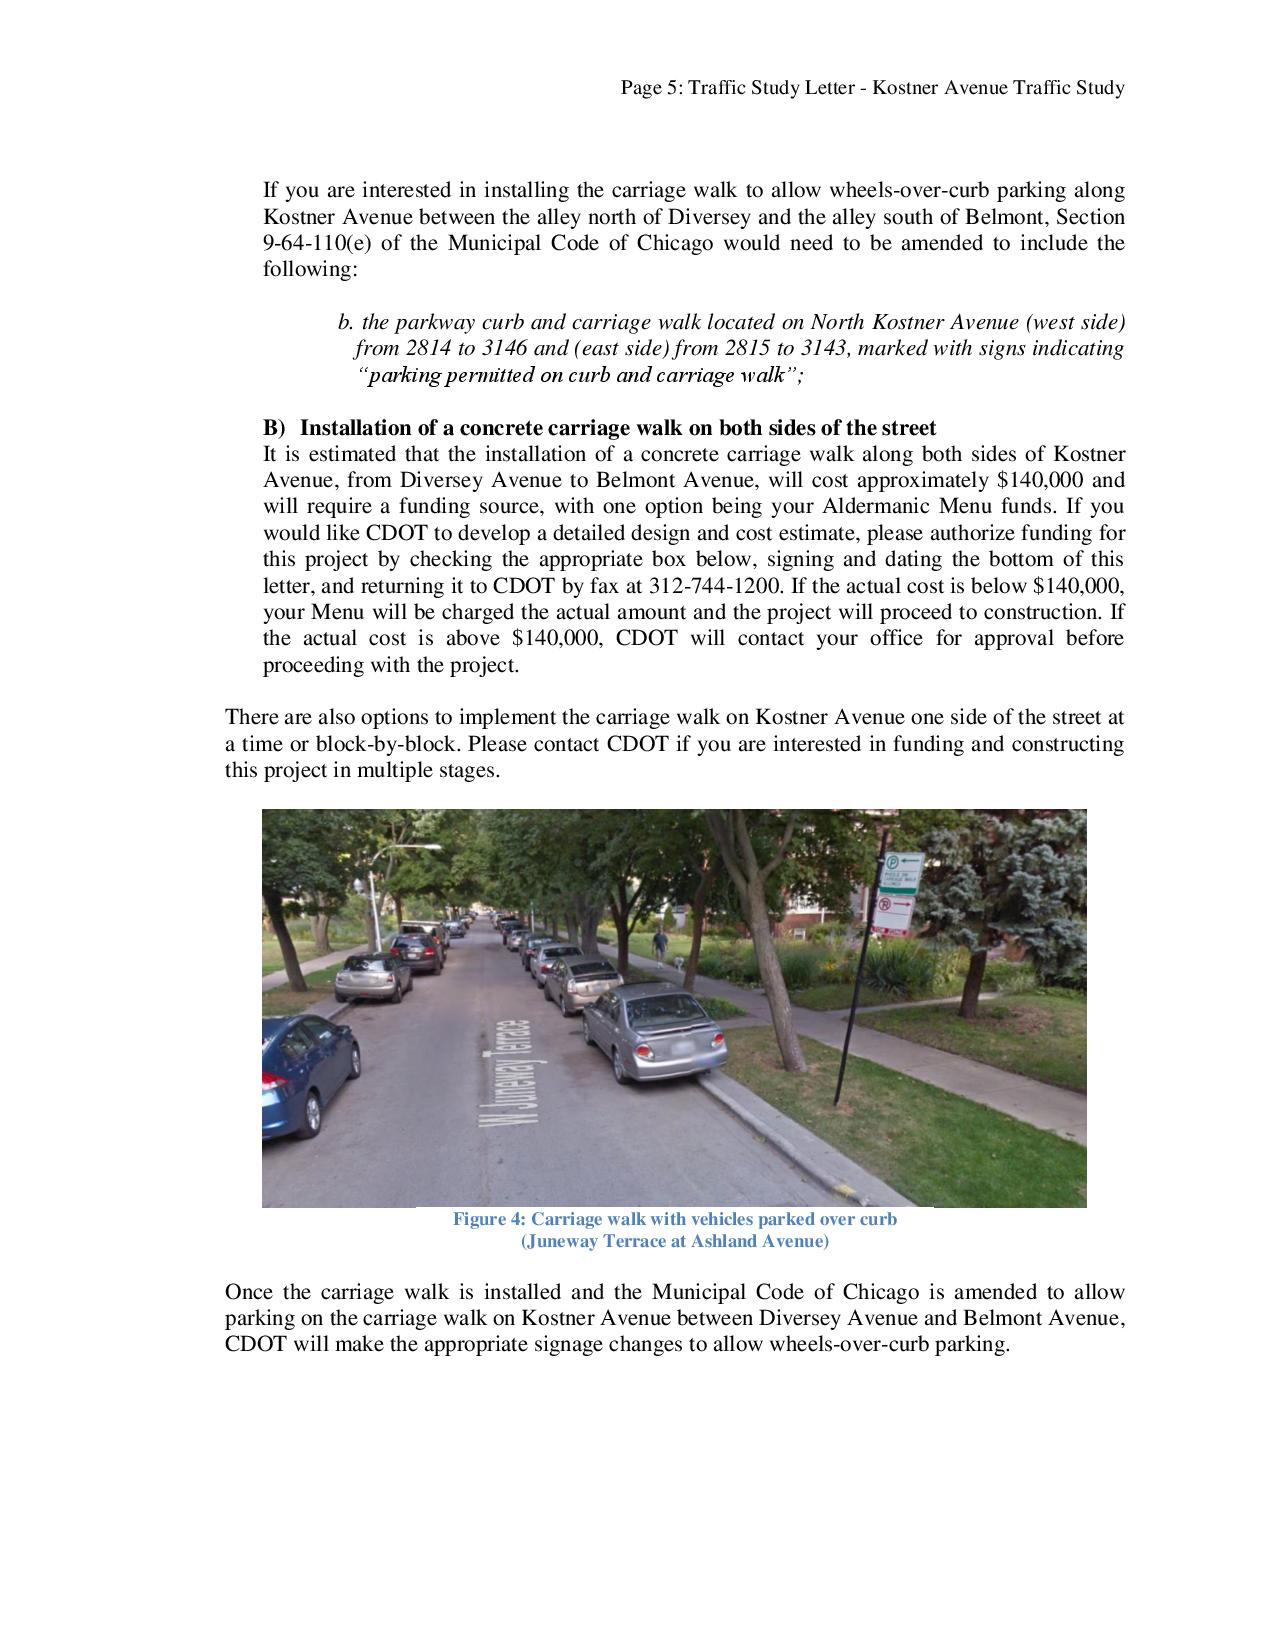 Kostner_Avenue_Traffic_Study_Letter-page-005.jpg